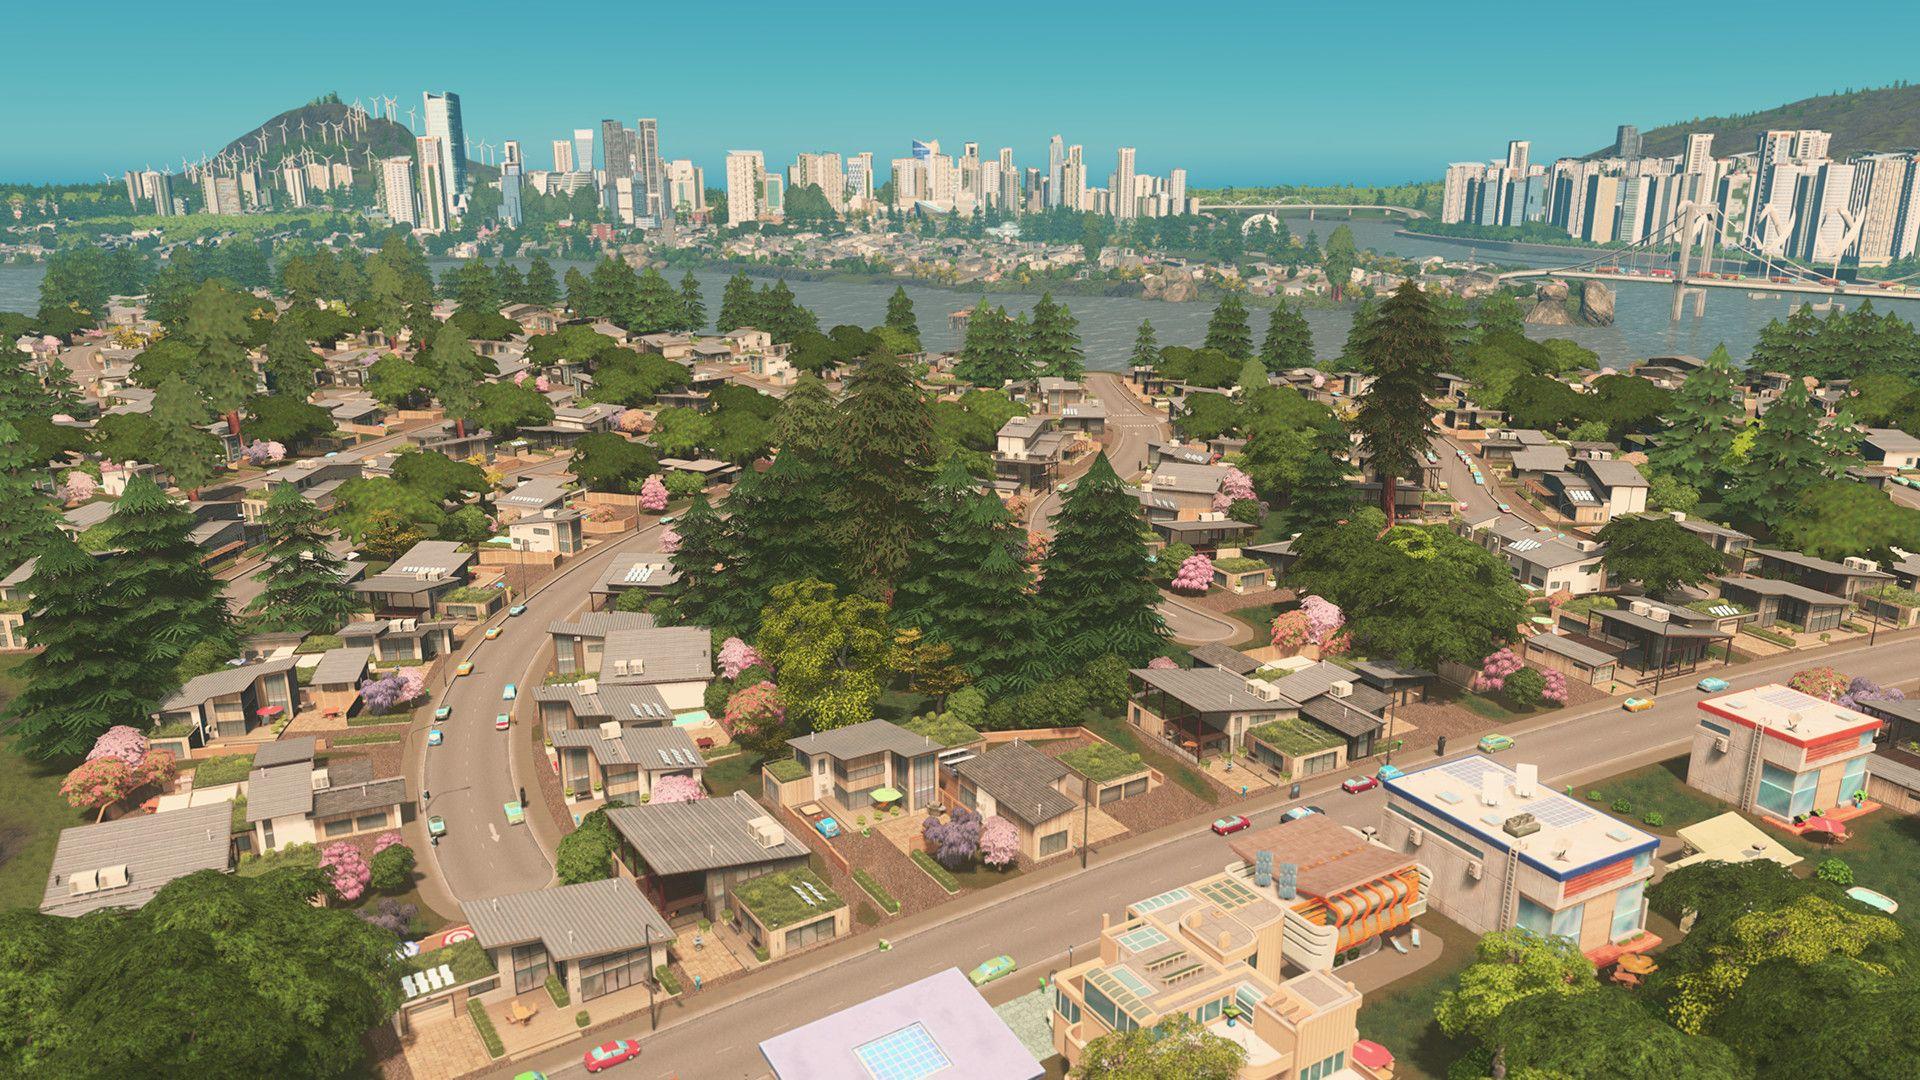 CITIESGREENCITIES3.jpg